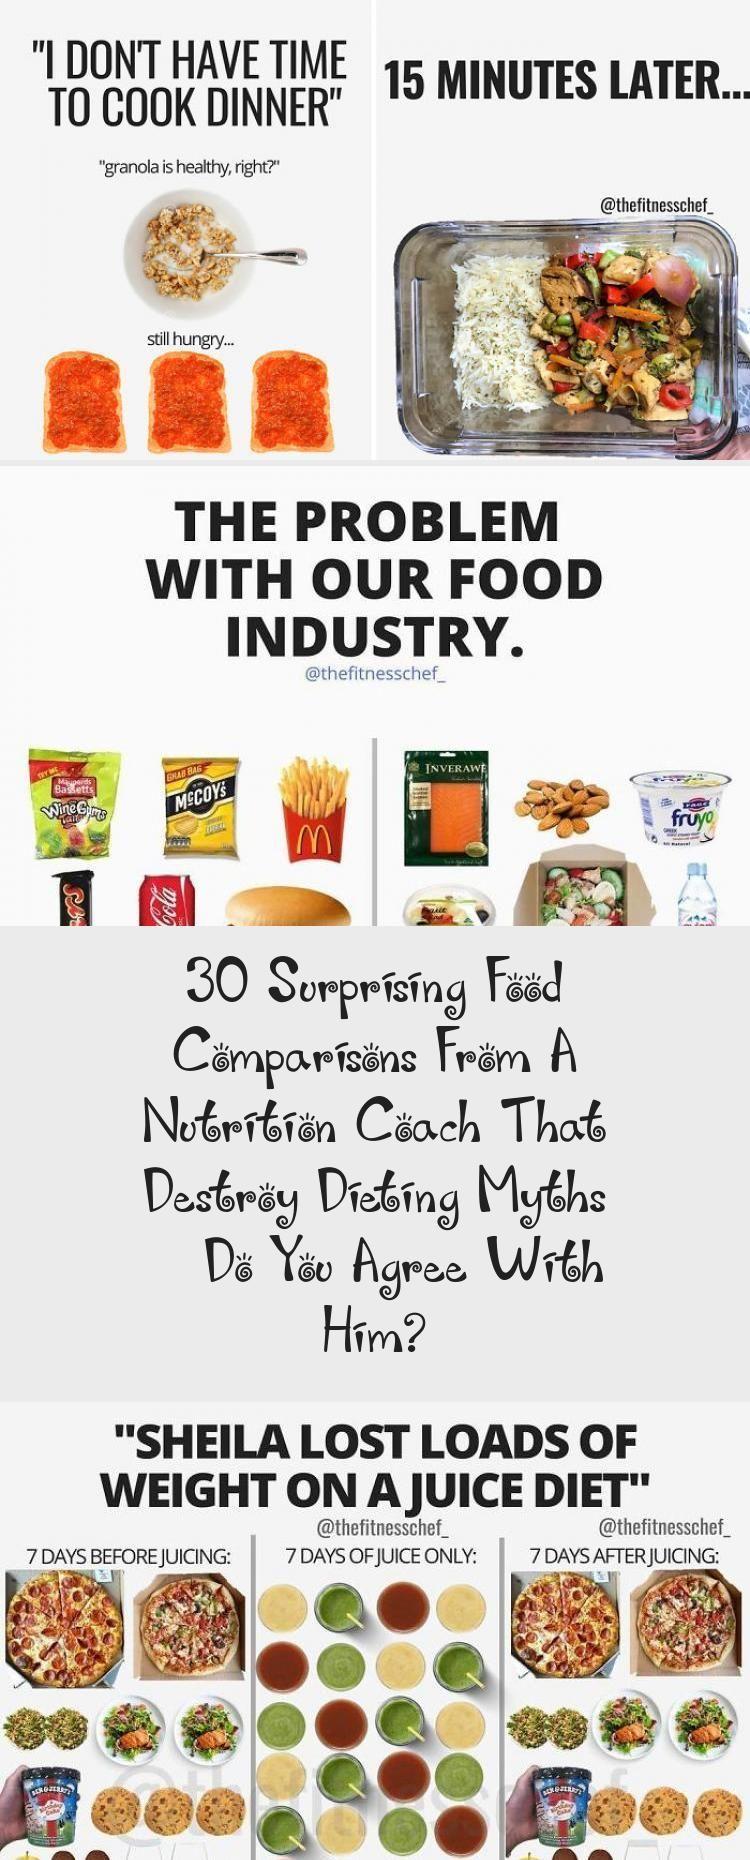 Nutrition Blog Website Nutritionplanforfatloss Nutrition Activities For Kids High Schools Nutritio Nutrition Recipes Nutrition Drinks Nutritional Snacks